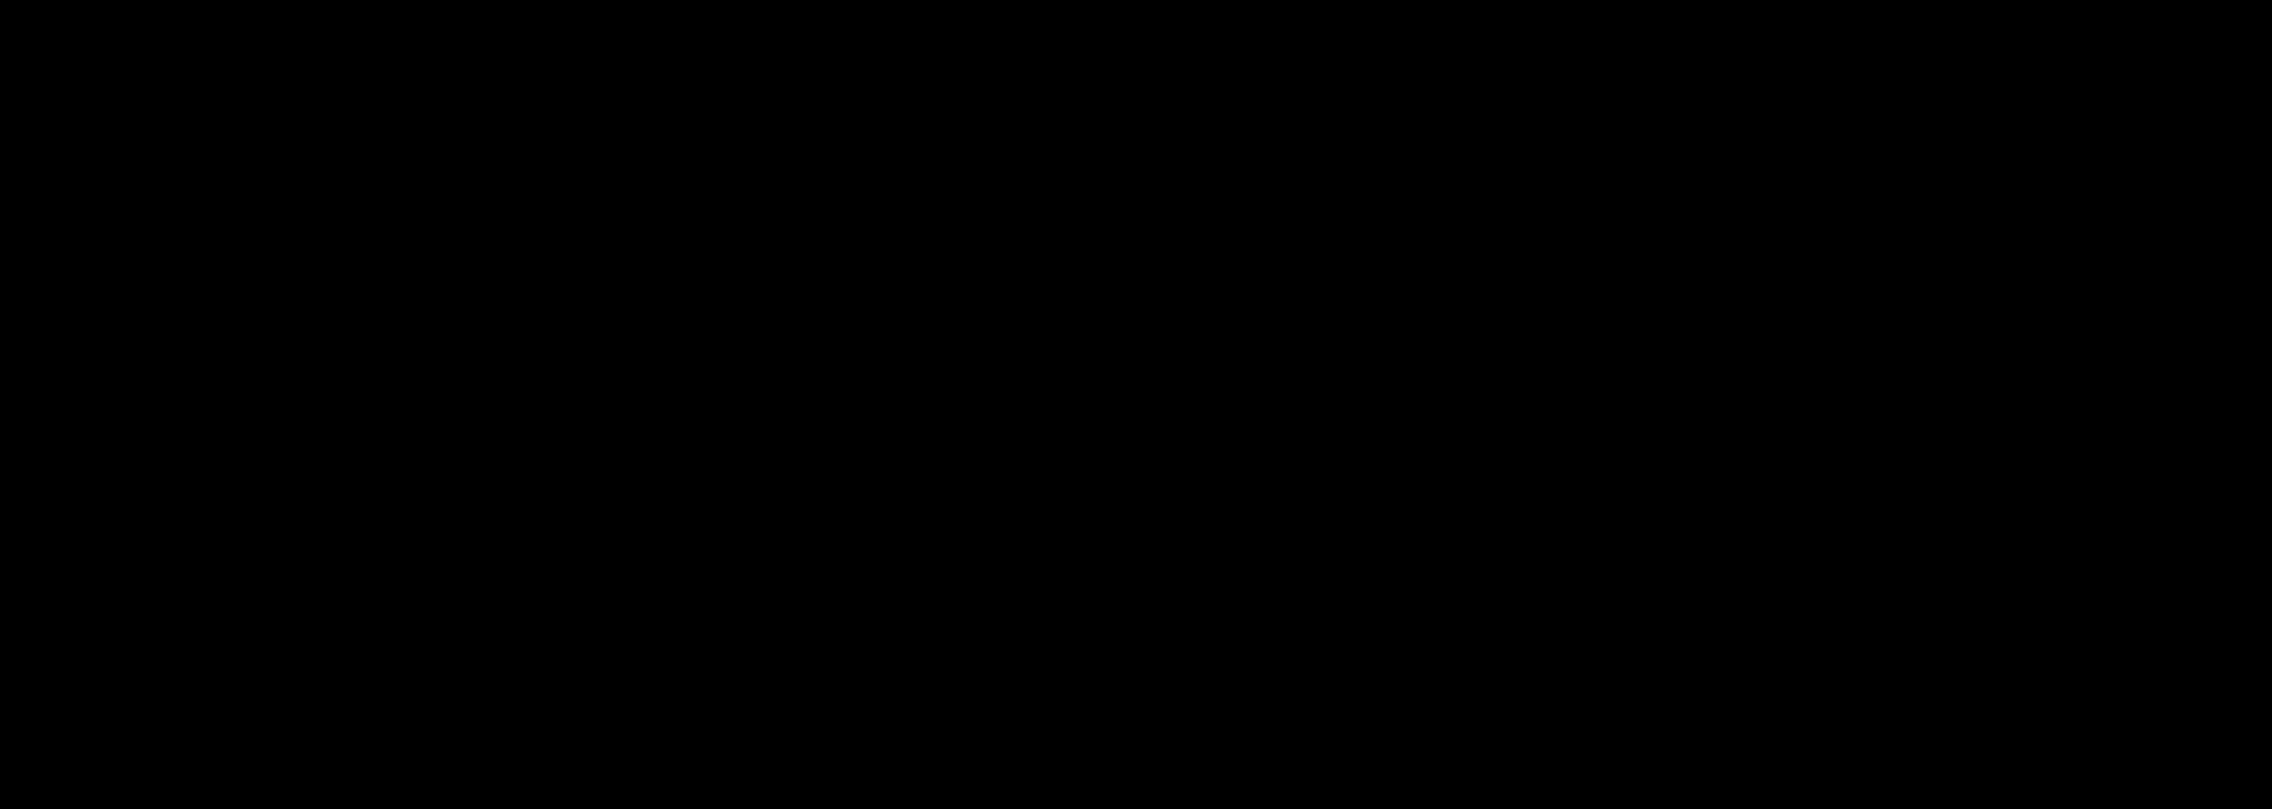 Free Heartbeat Long Line Png With Transparent Background Le soluzioni dei cruciverba del vol. https www vecteezy com png 1188041 heartbeat long line